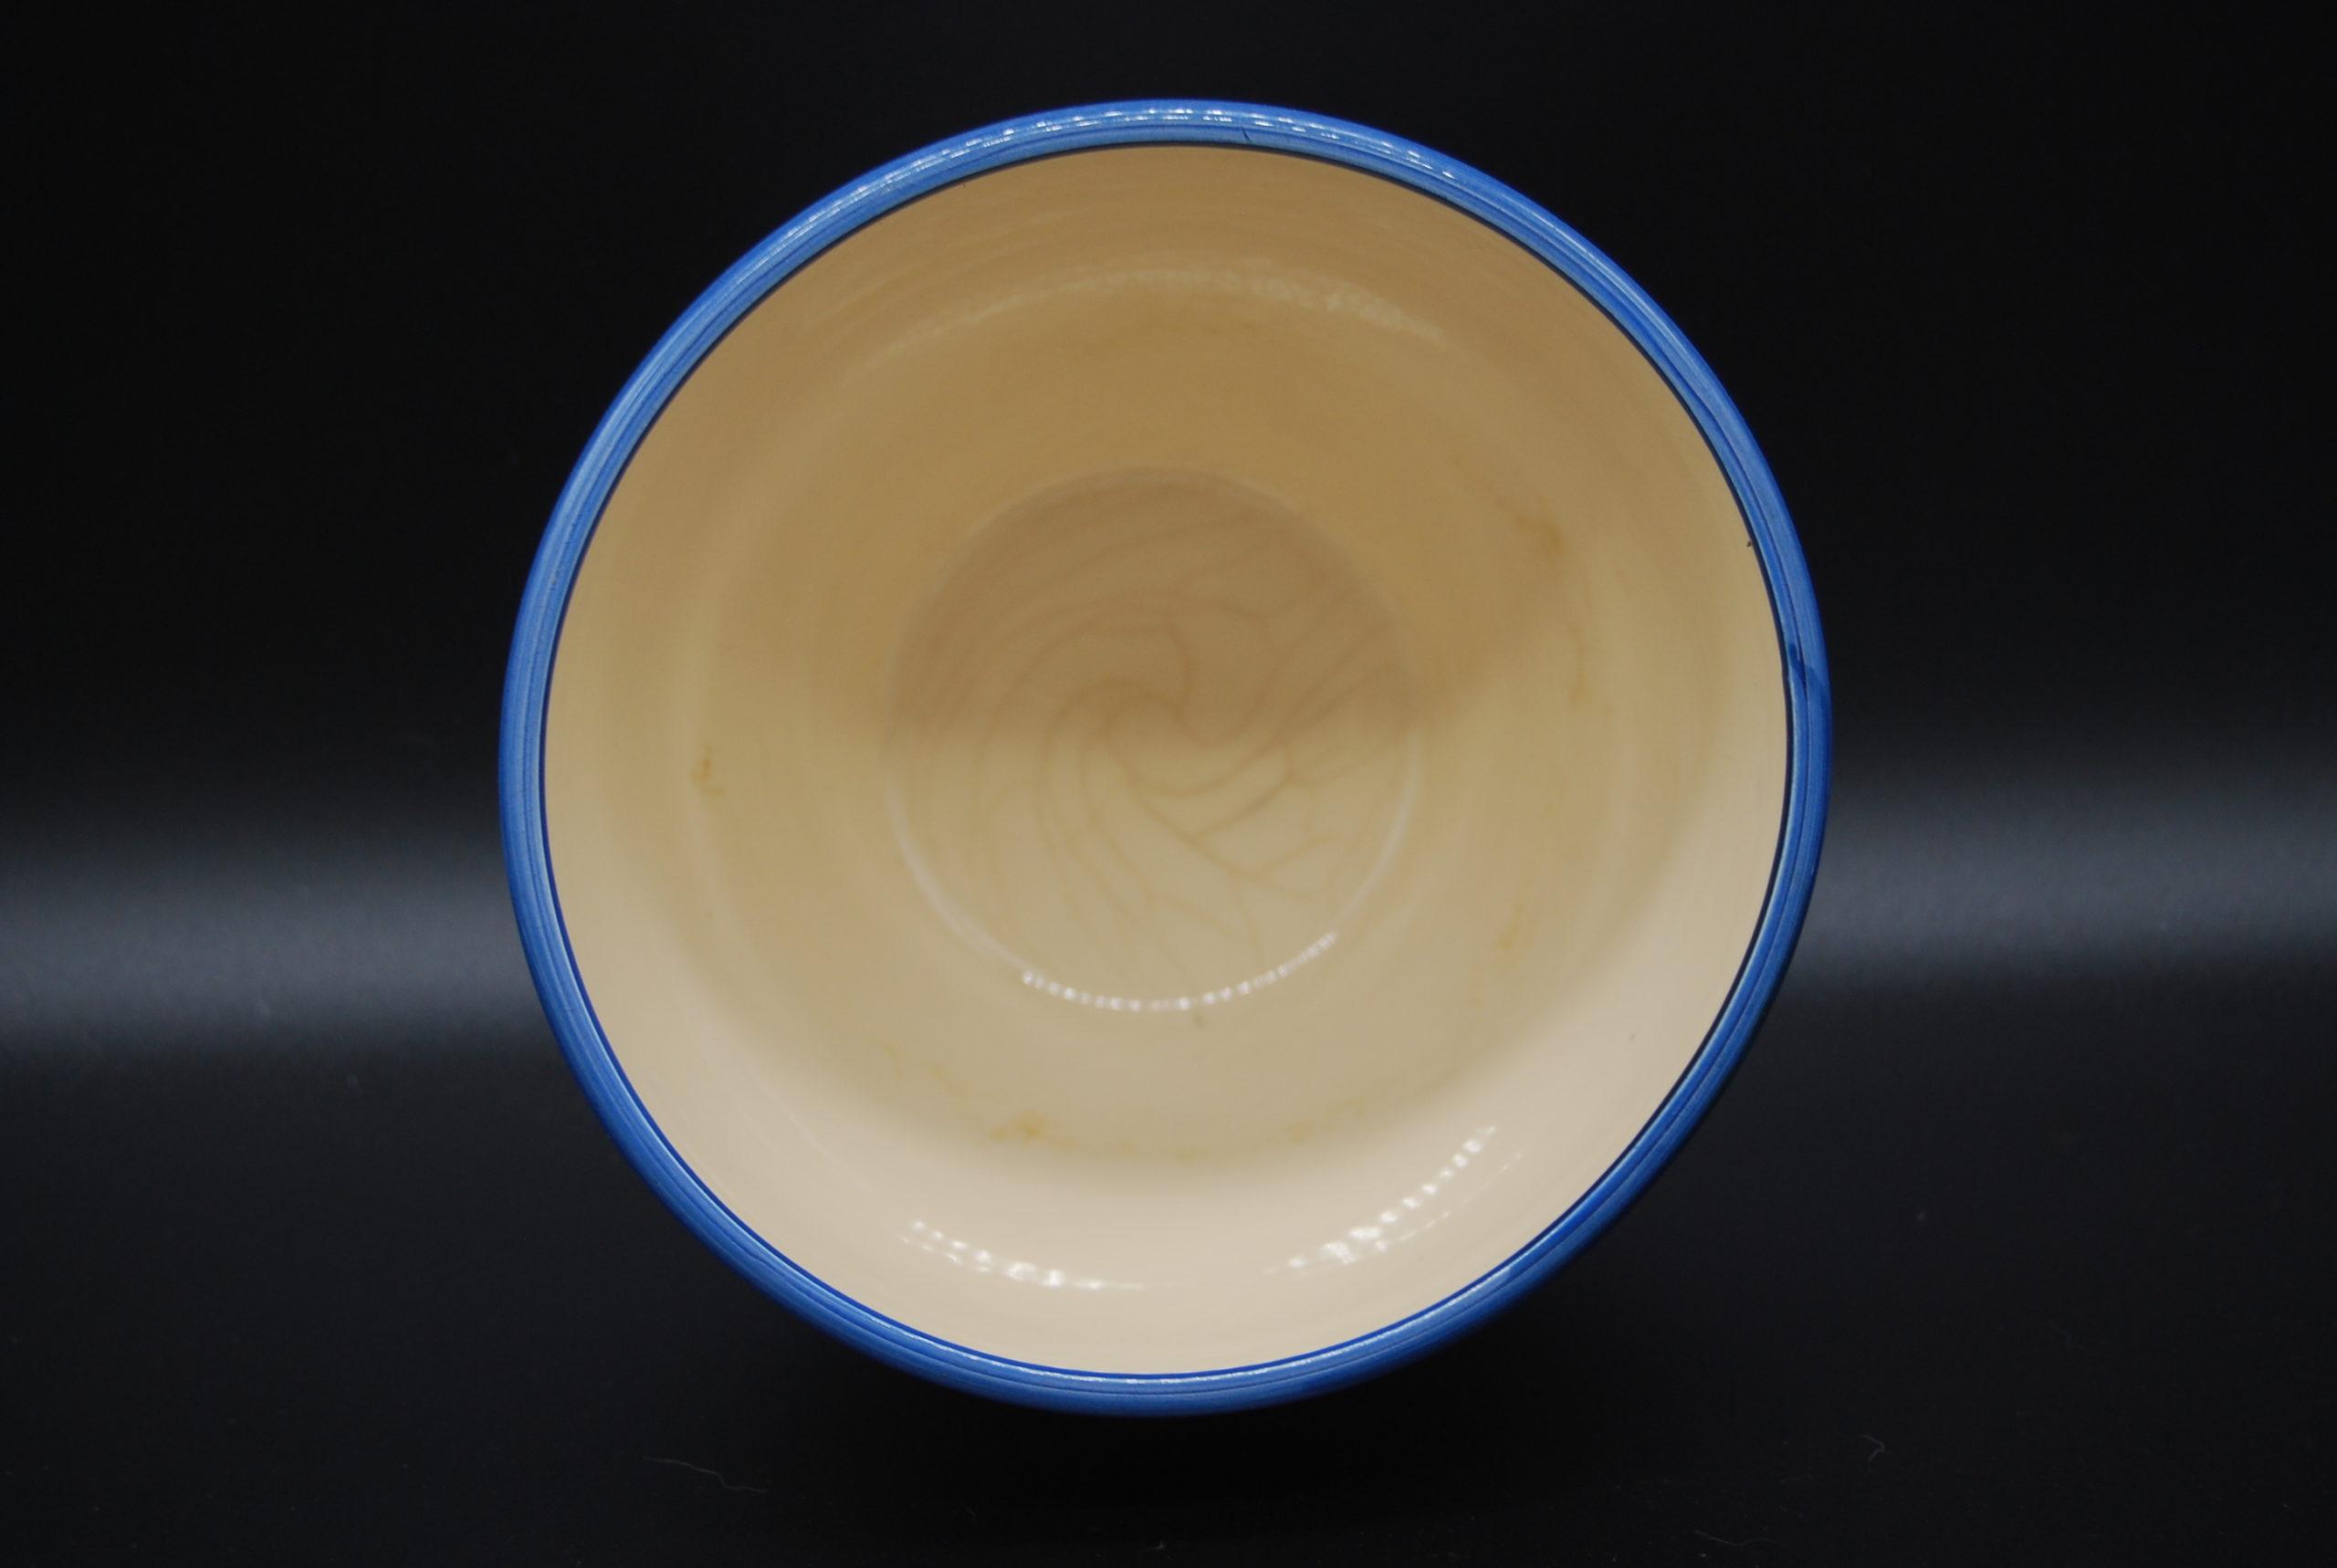 Bloempot blauwwit 4